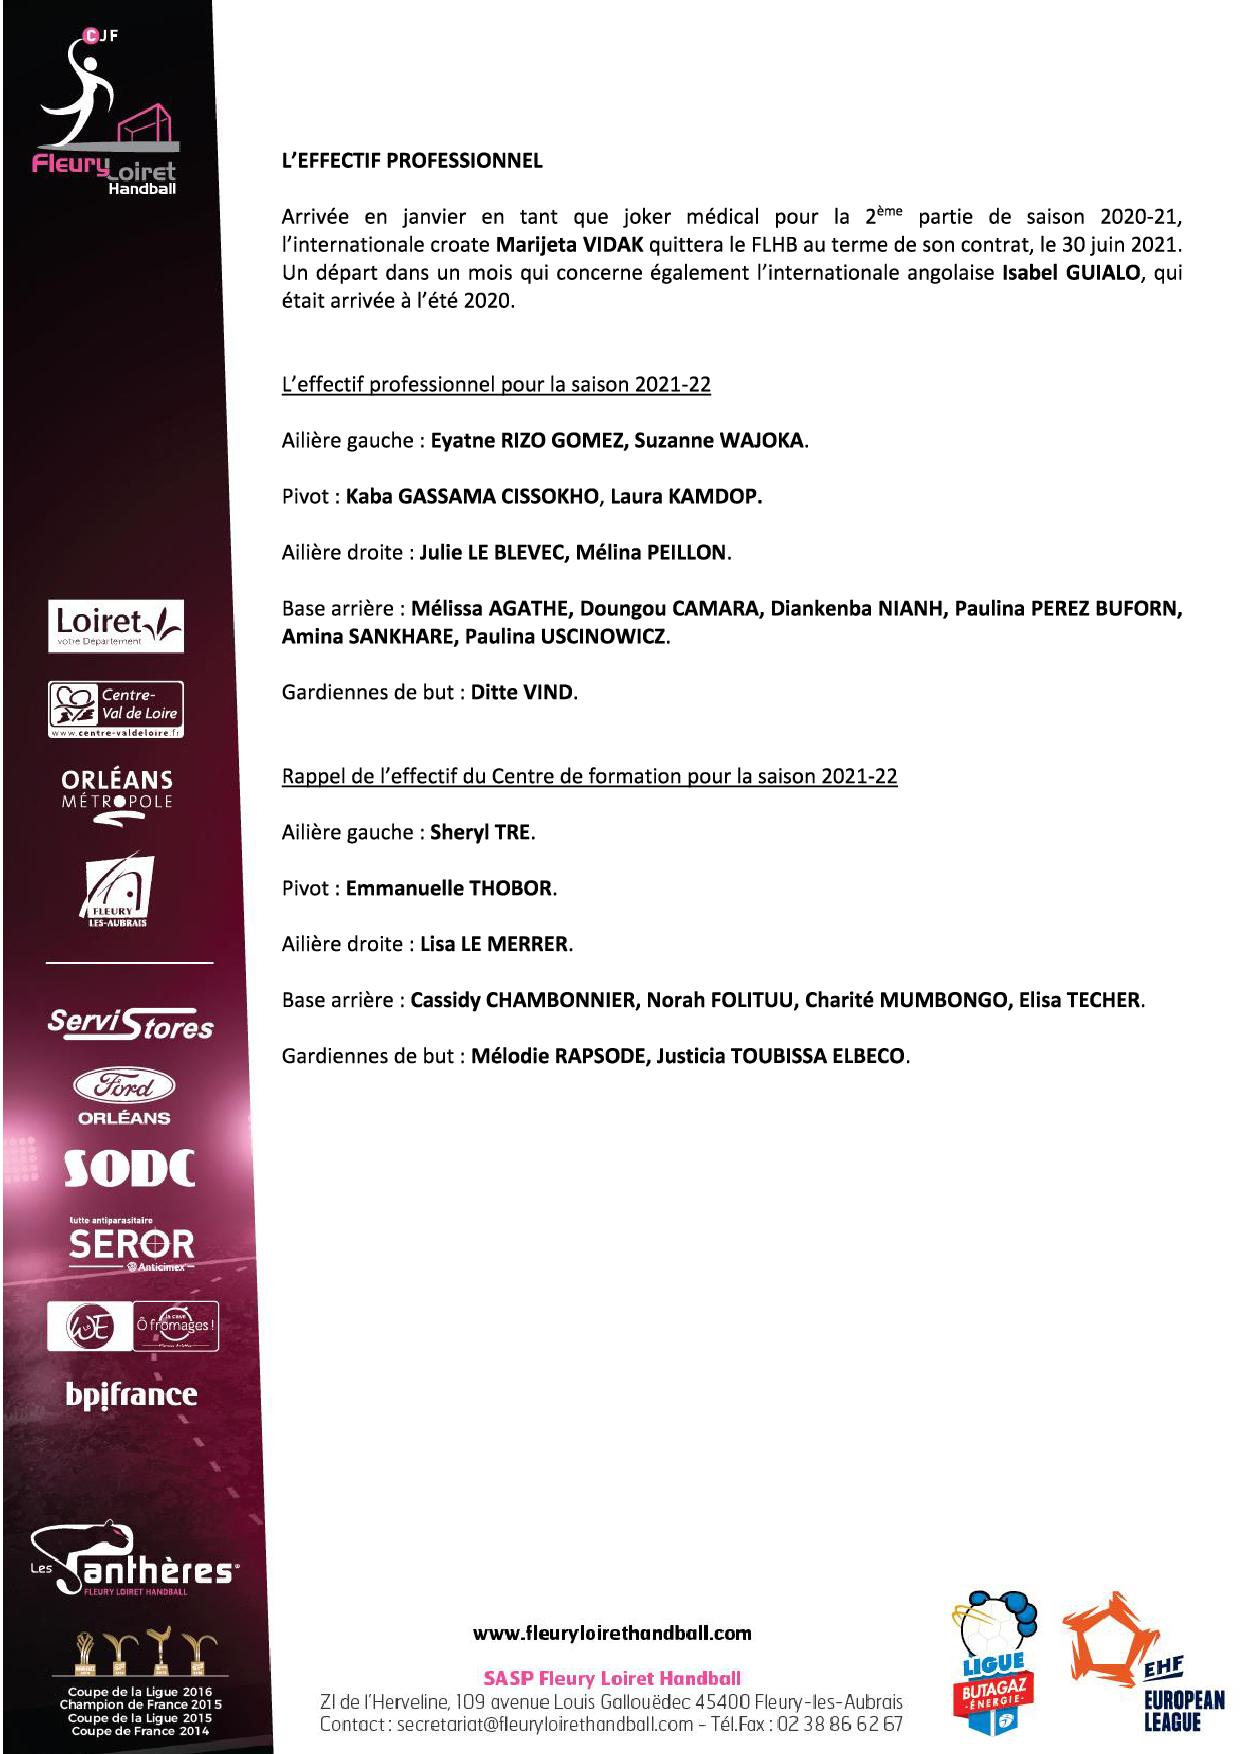 Communiqué Fleury Loiret Handball - Vendredi 28 mai 20212.jpg